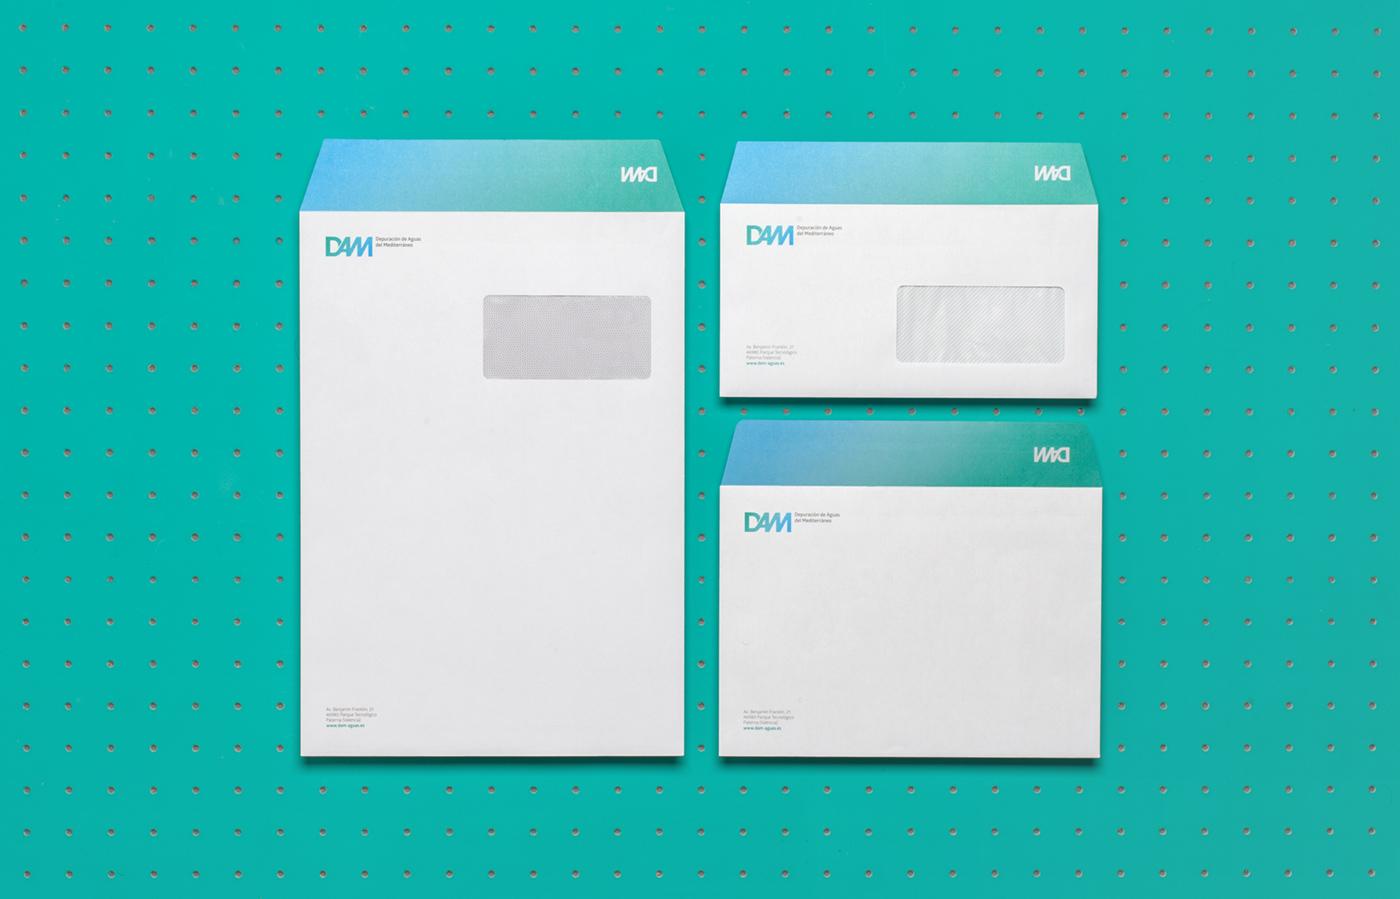 pixelarte-diseno-grafico-papeleria-corporativa-Dam_Depuracion_Aguas_Mediterraneo